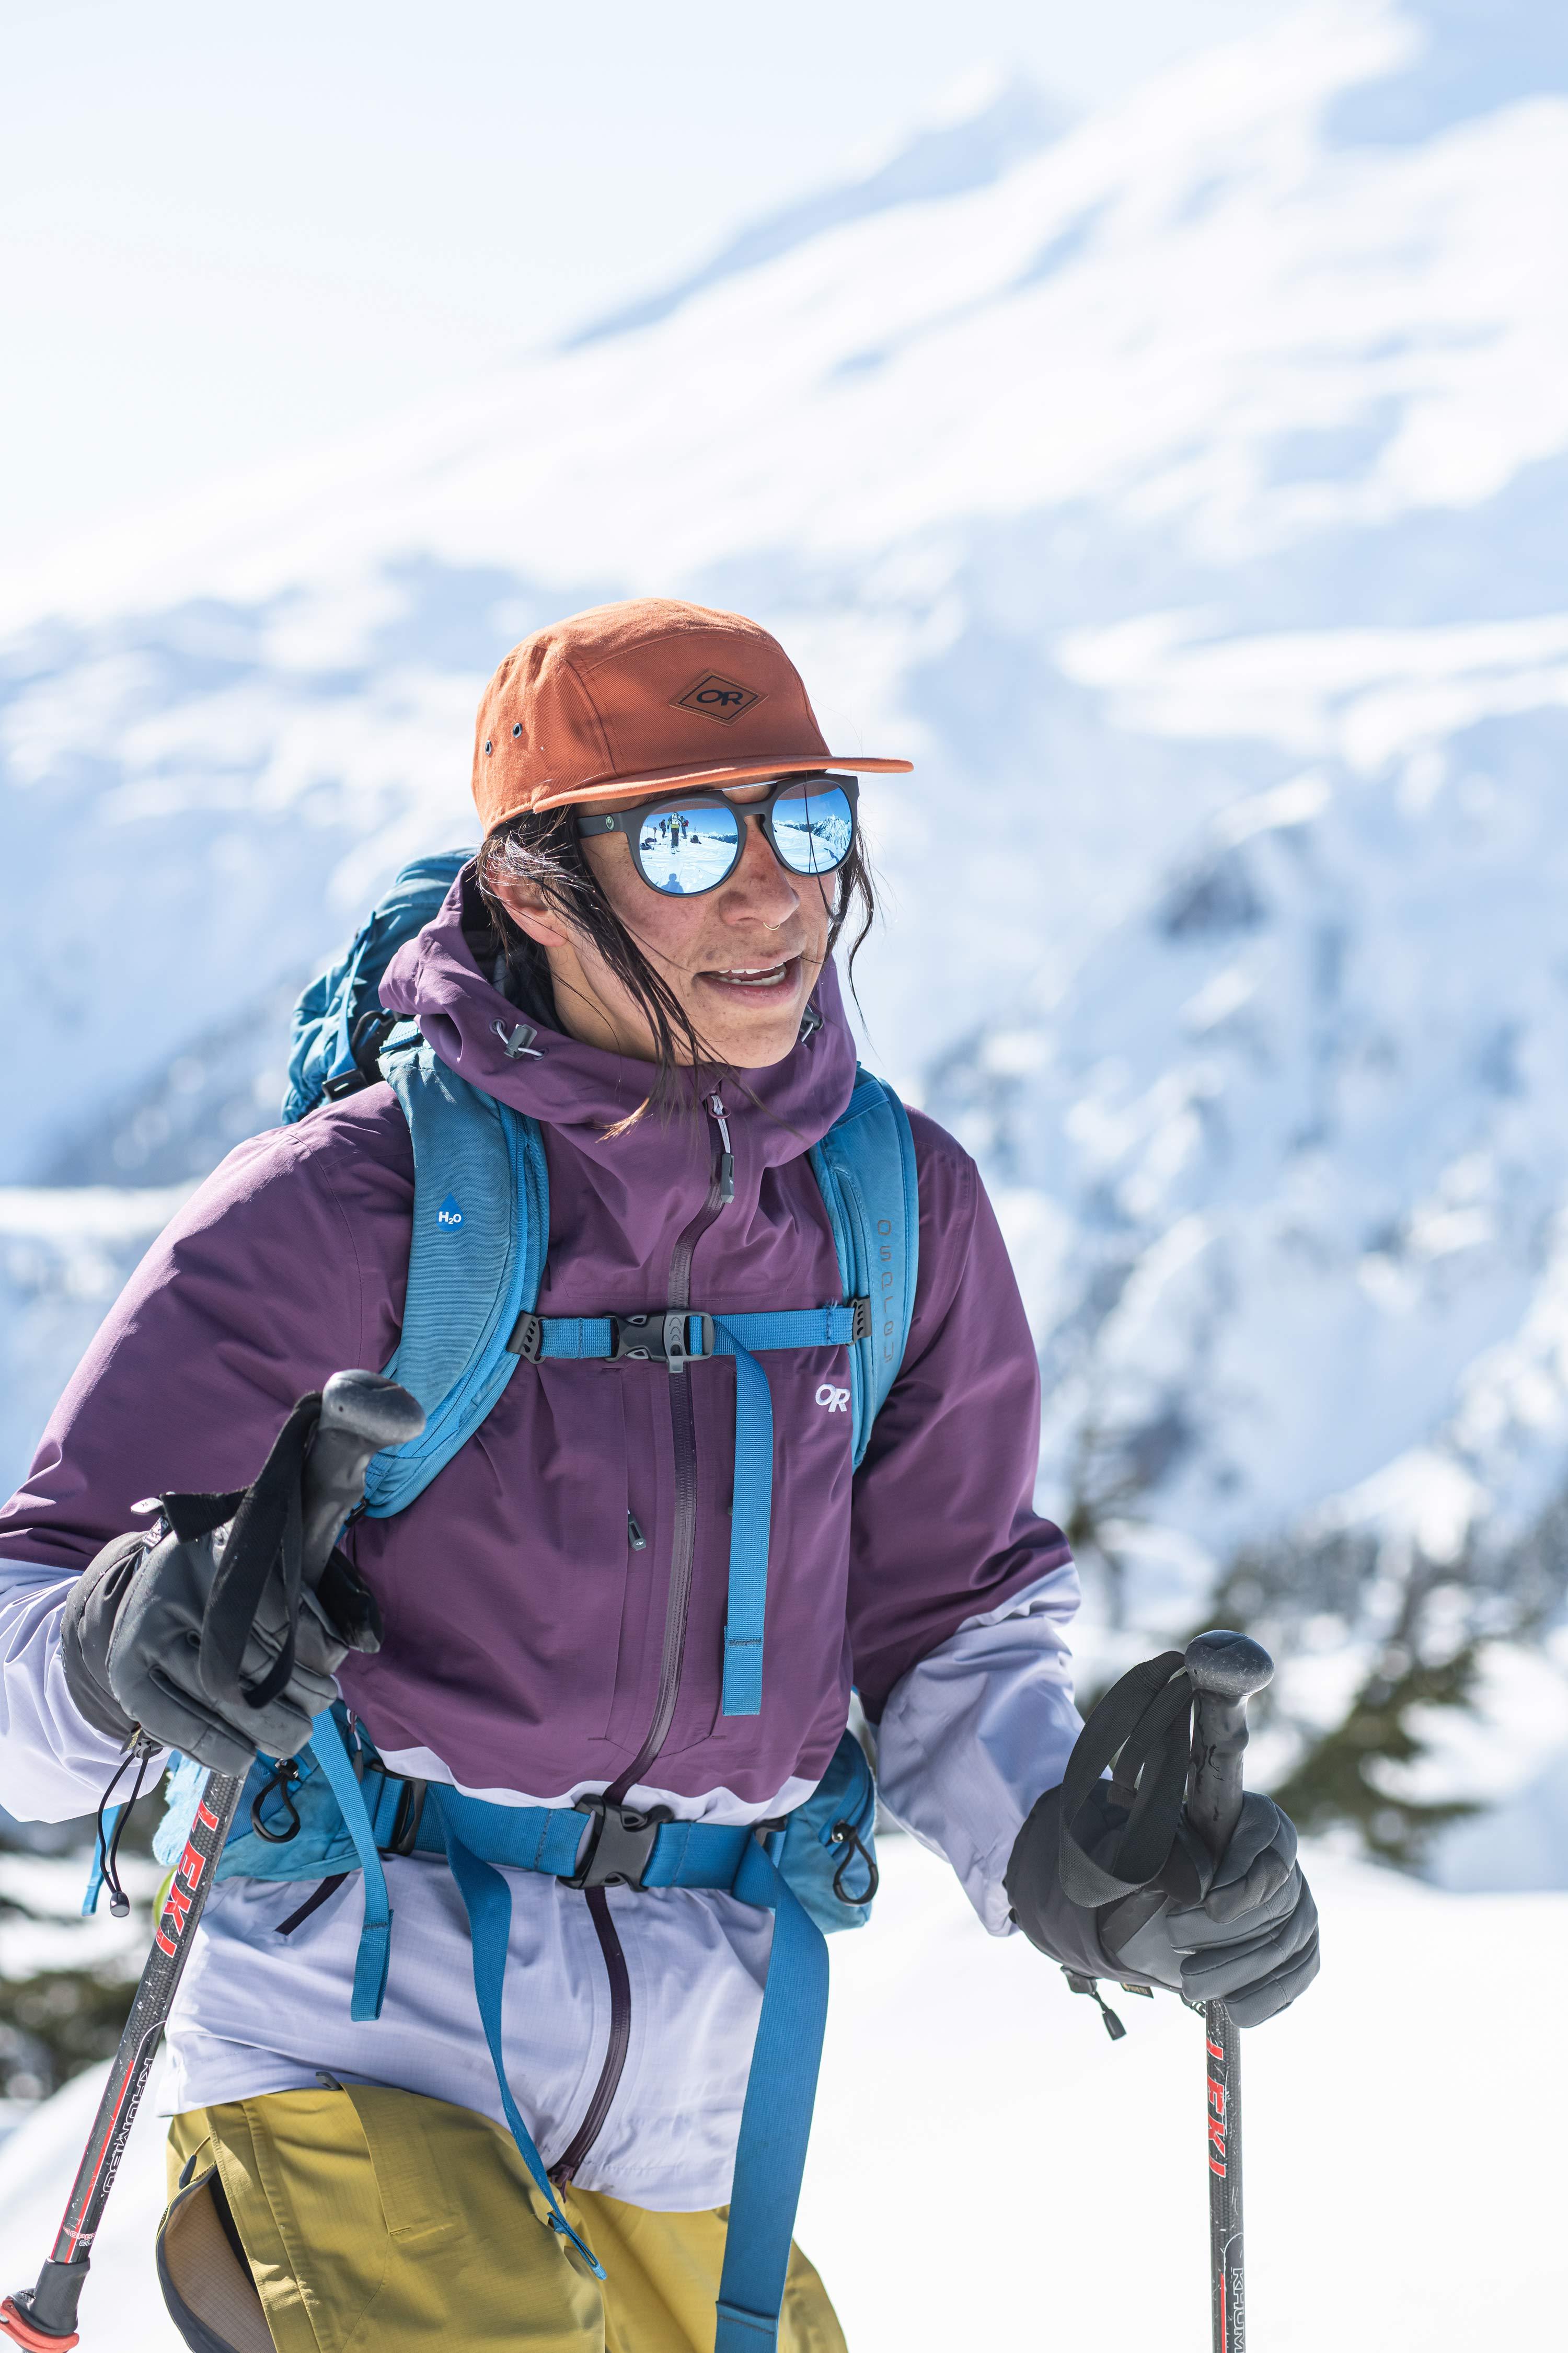 backcoountry-skiing-and-splitboarding-gear-dirtbagdreams.com